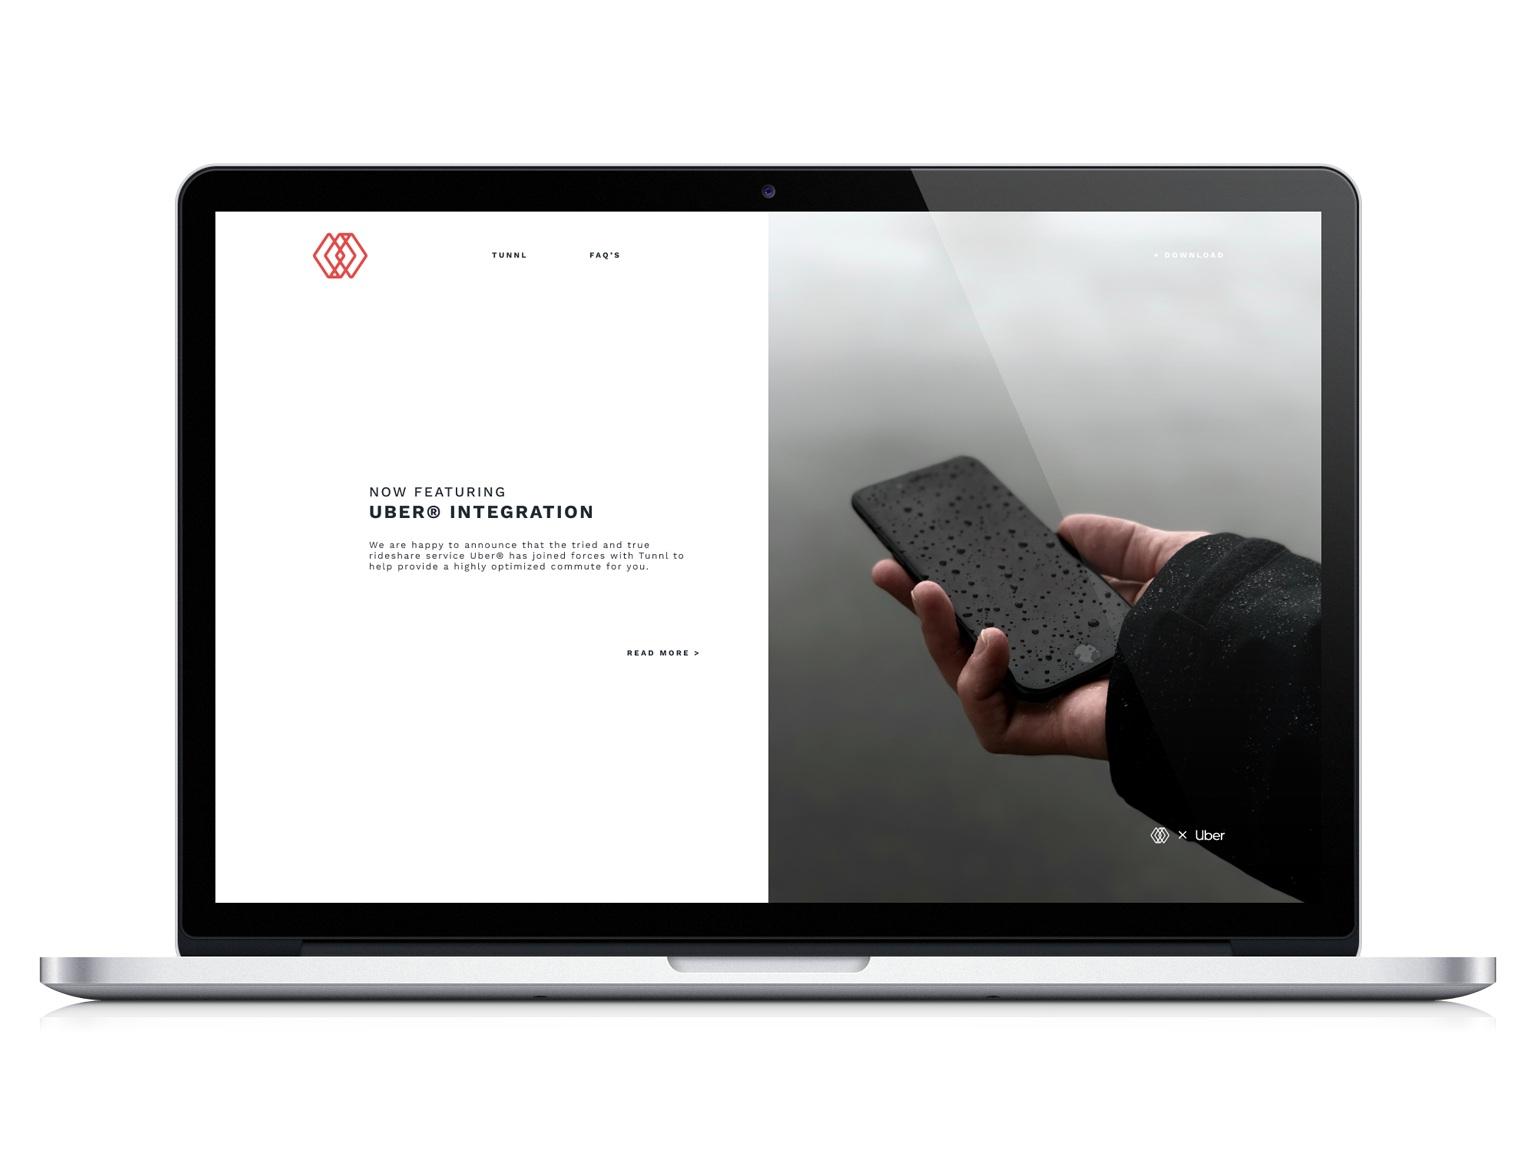 MacBook-Pro-mockup-3.jpg